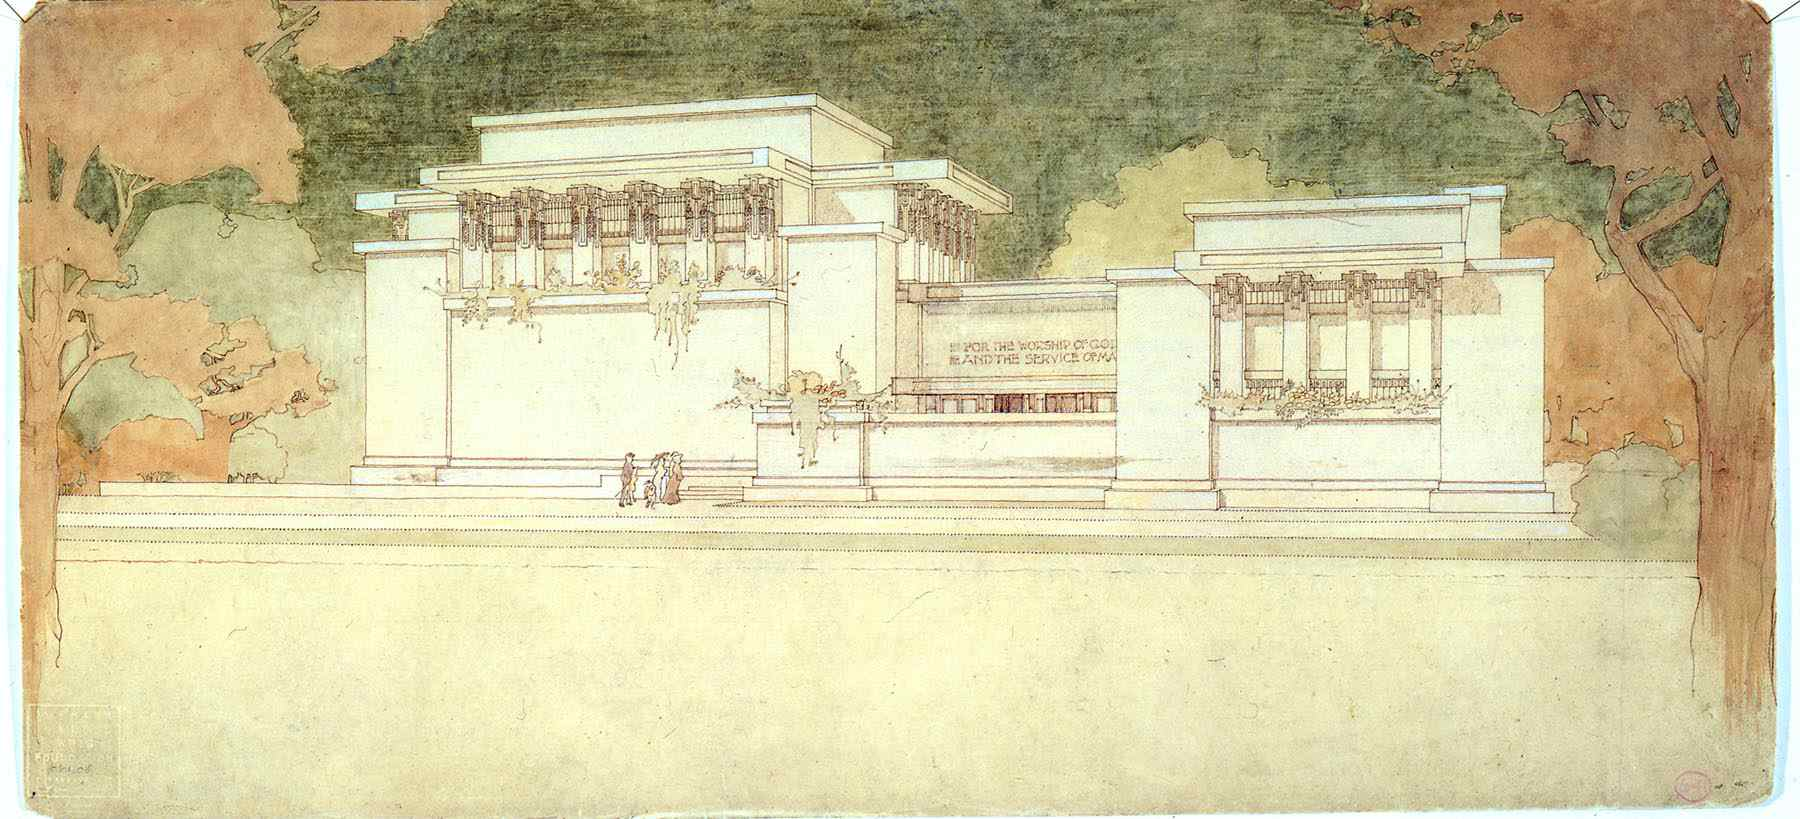 Unity Temple Drawing by Frank Lloyd Wright